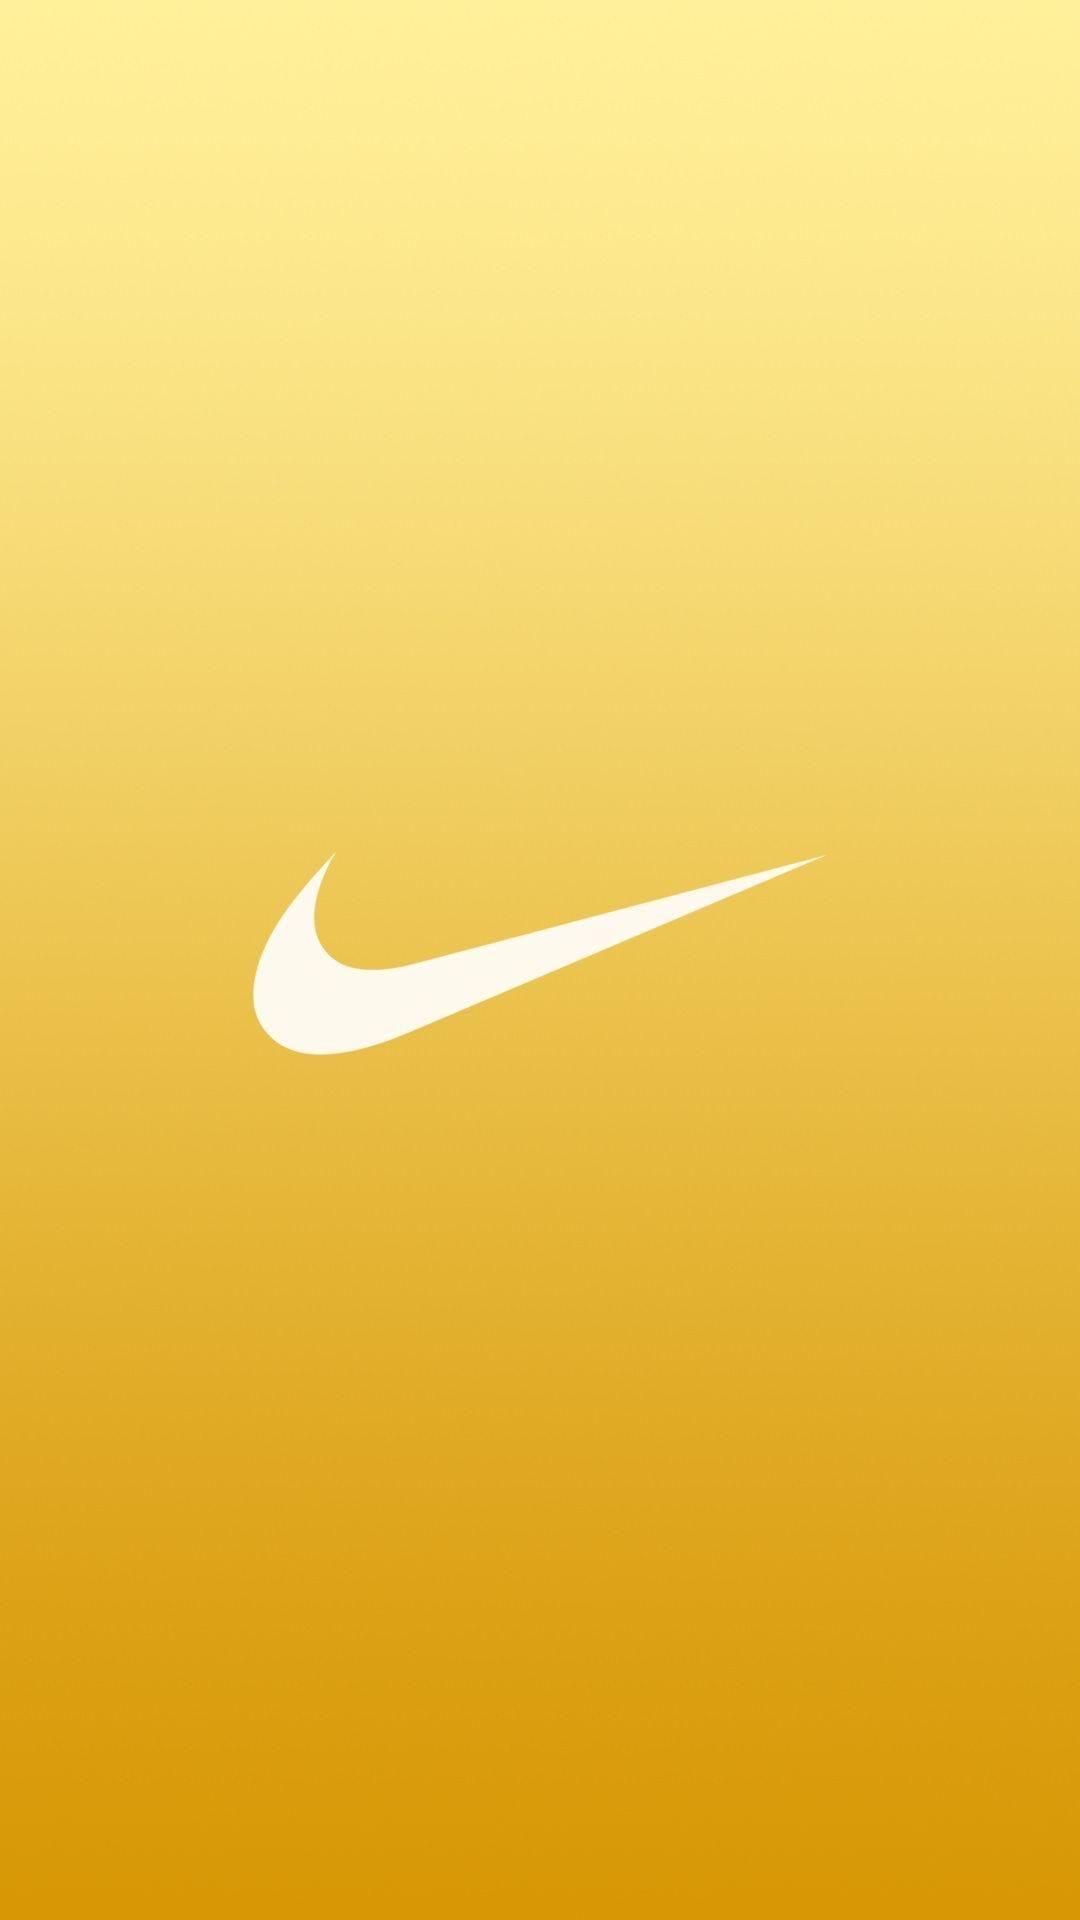 Wallpaper Nike yellow orange mercurial surfboard